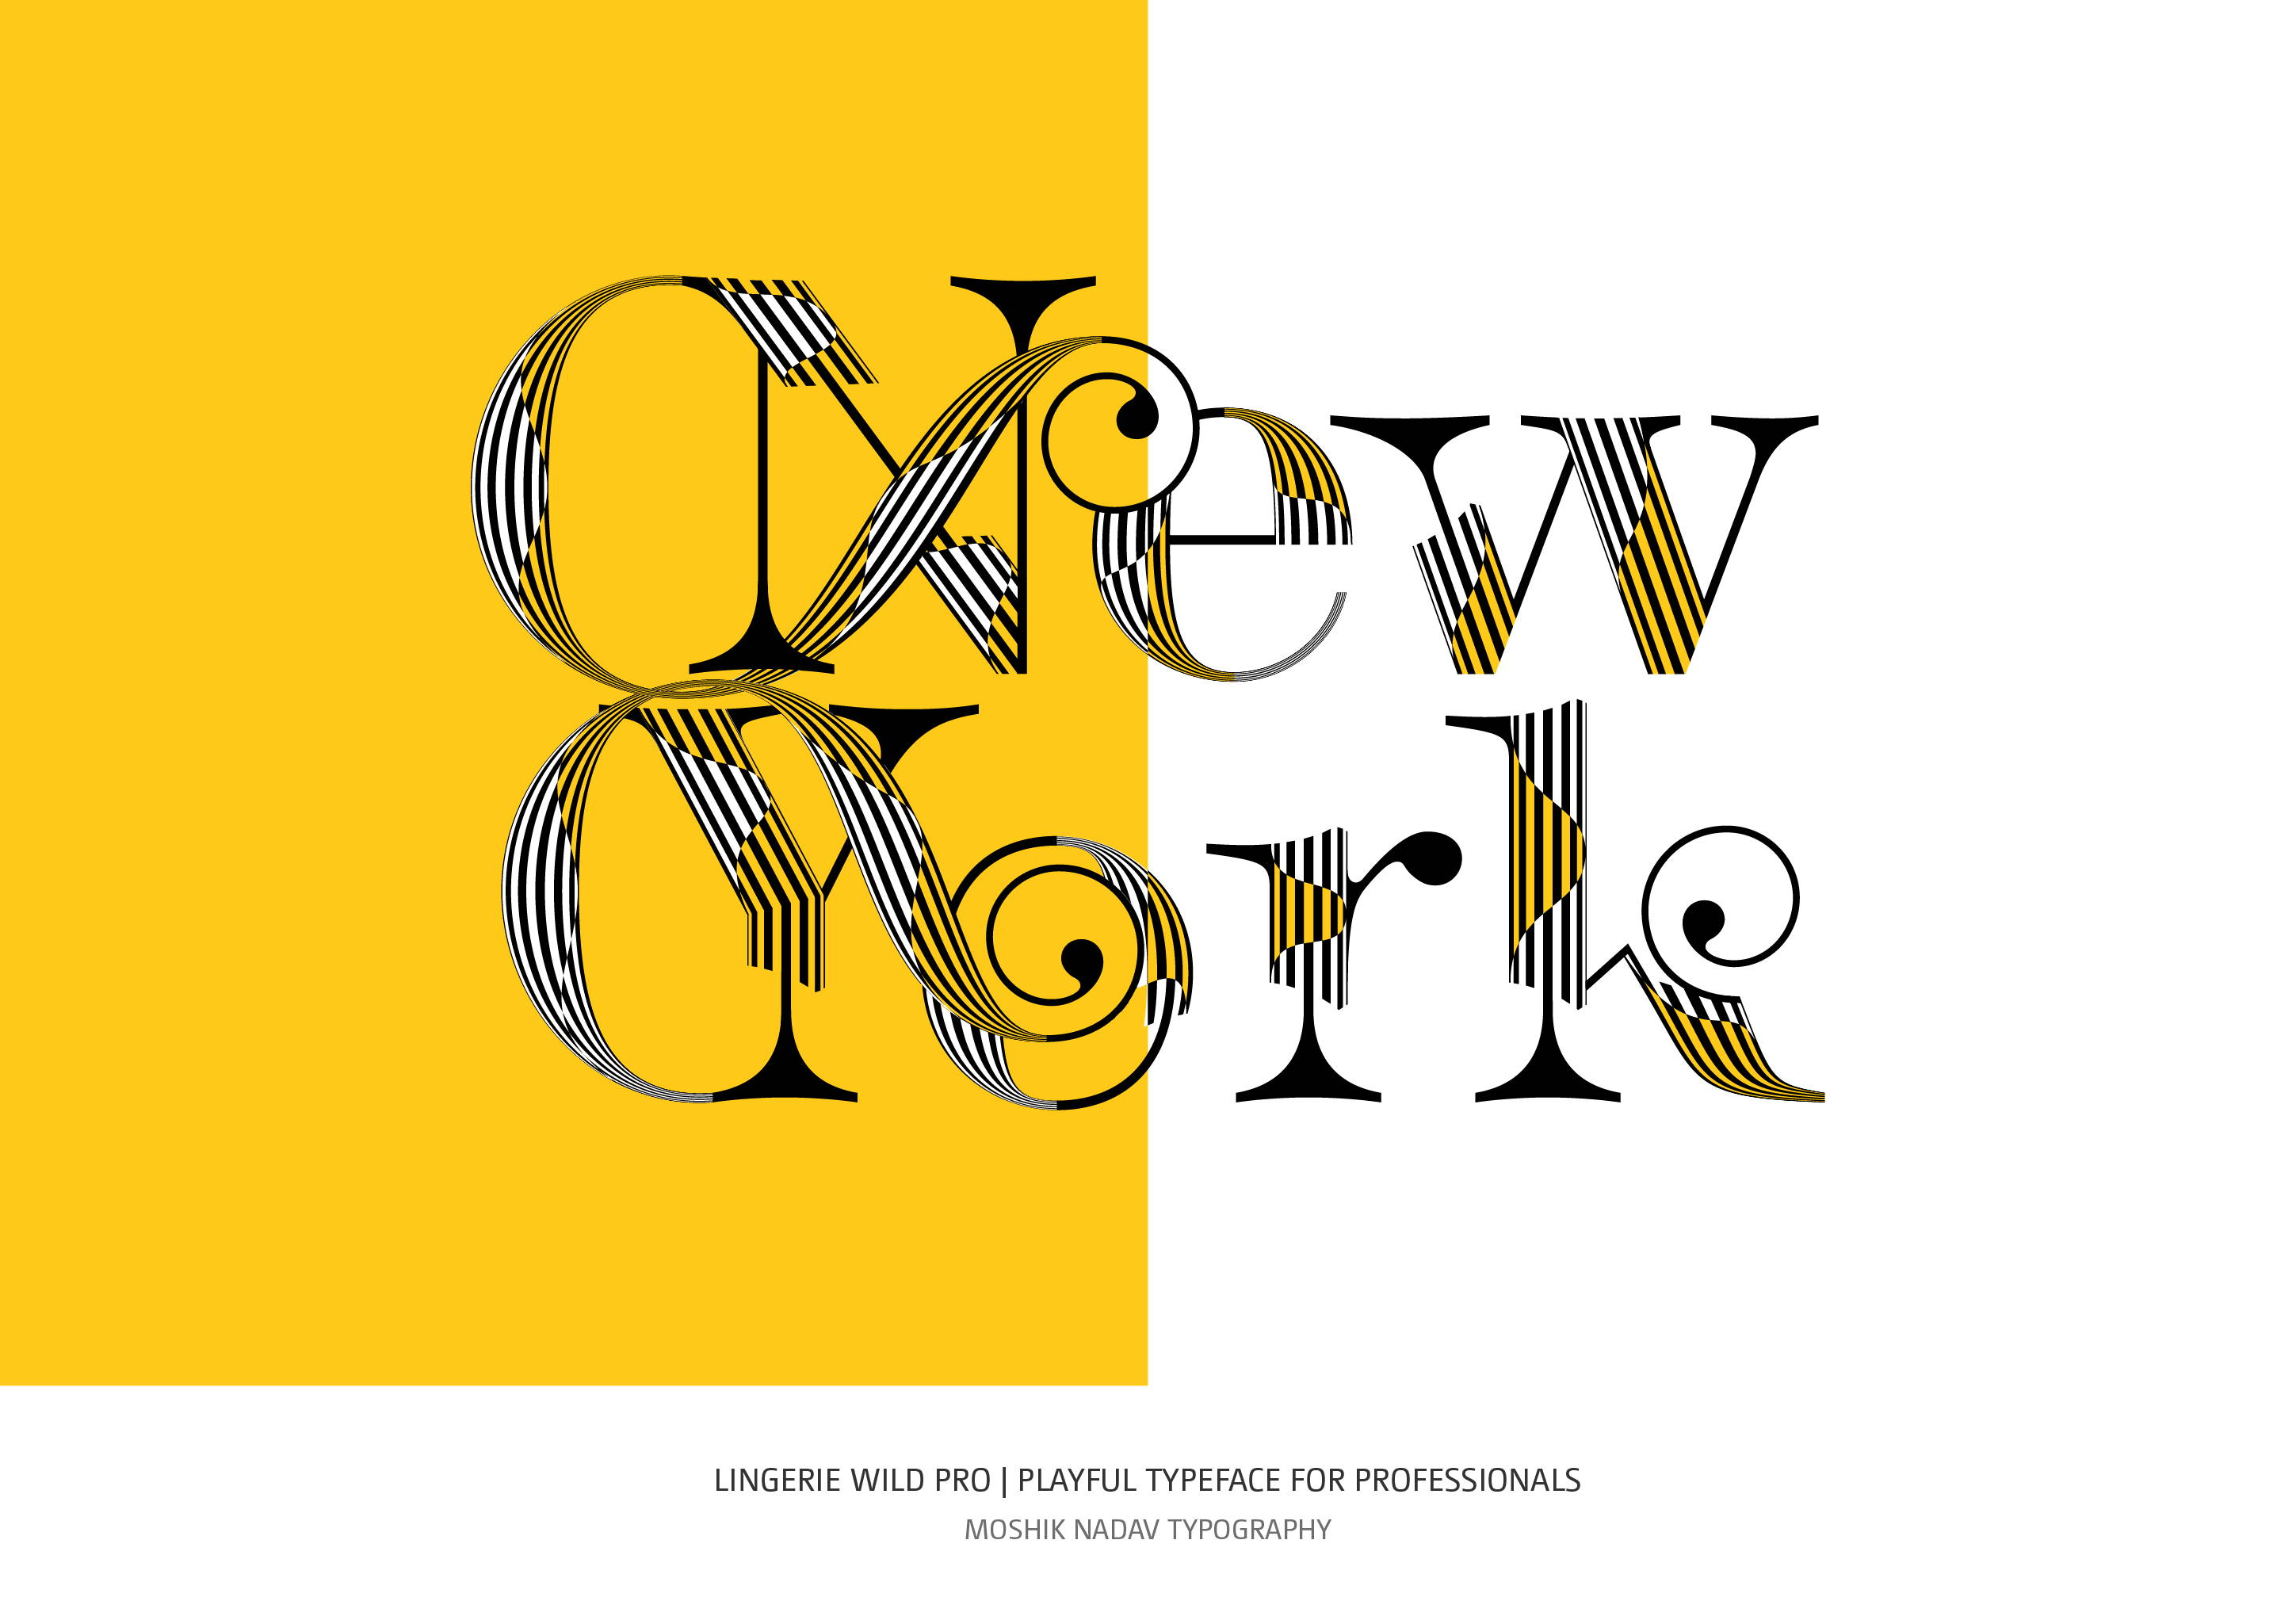 Lingerie Wild Pro, New York logo, Chimera X, sexy font, vogue font, moshik Nadav, ligatures, fashion buy fonts, best fonts ever, fashion magazine fonts, best fonts for logo design, must have fonts, fashion typeface, sexy ligatures, beautiful numbers